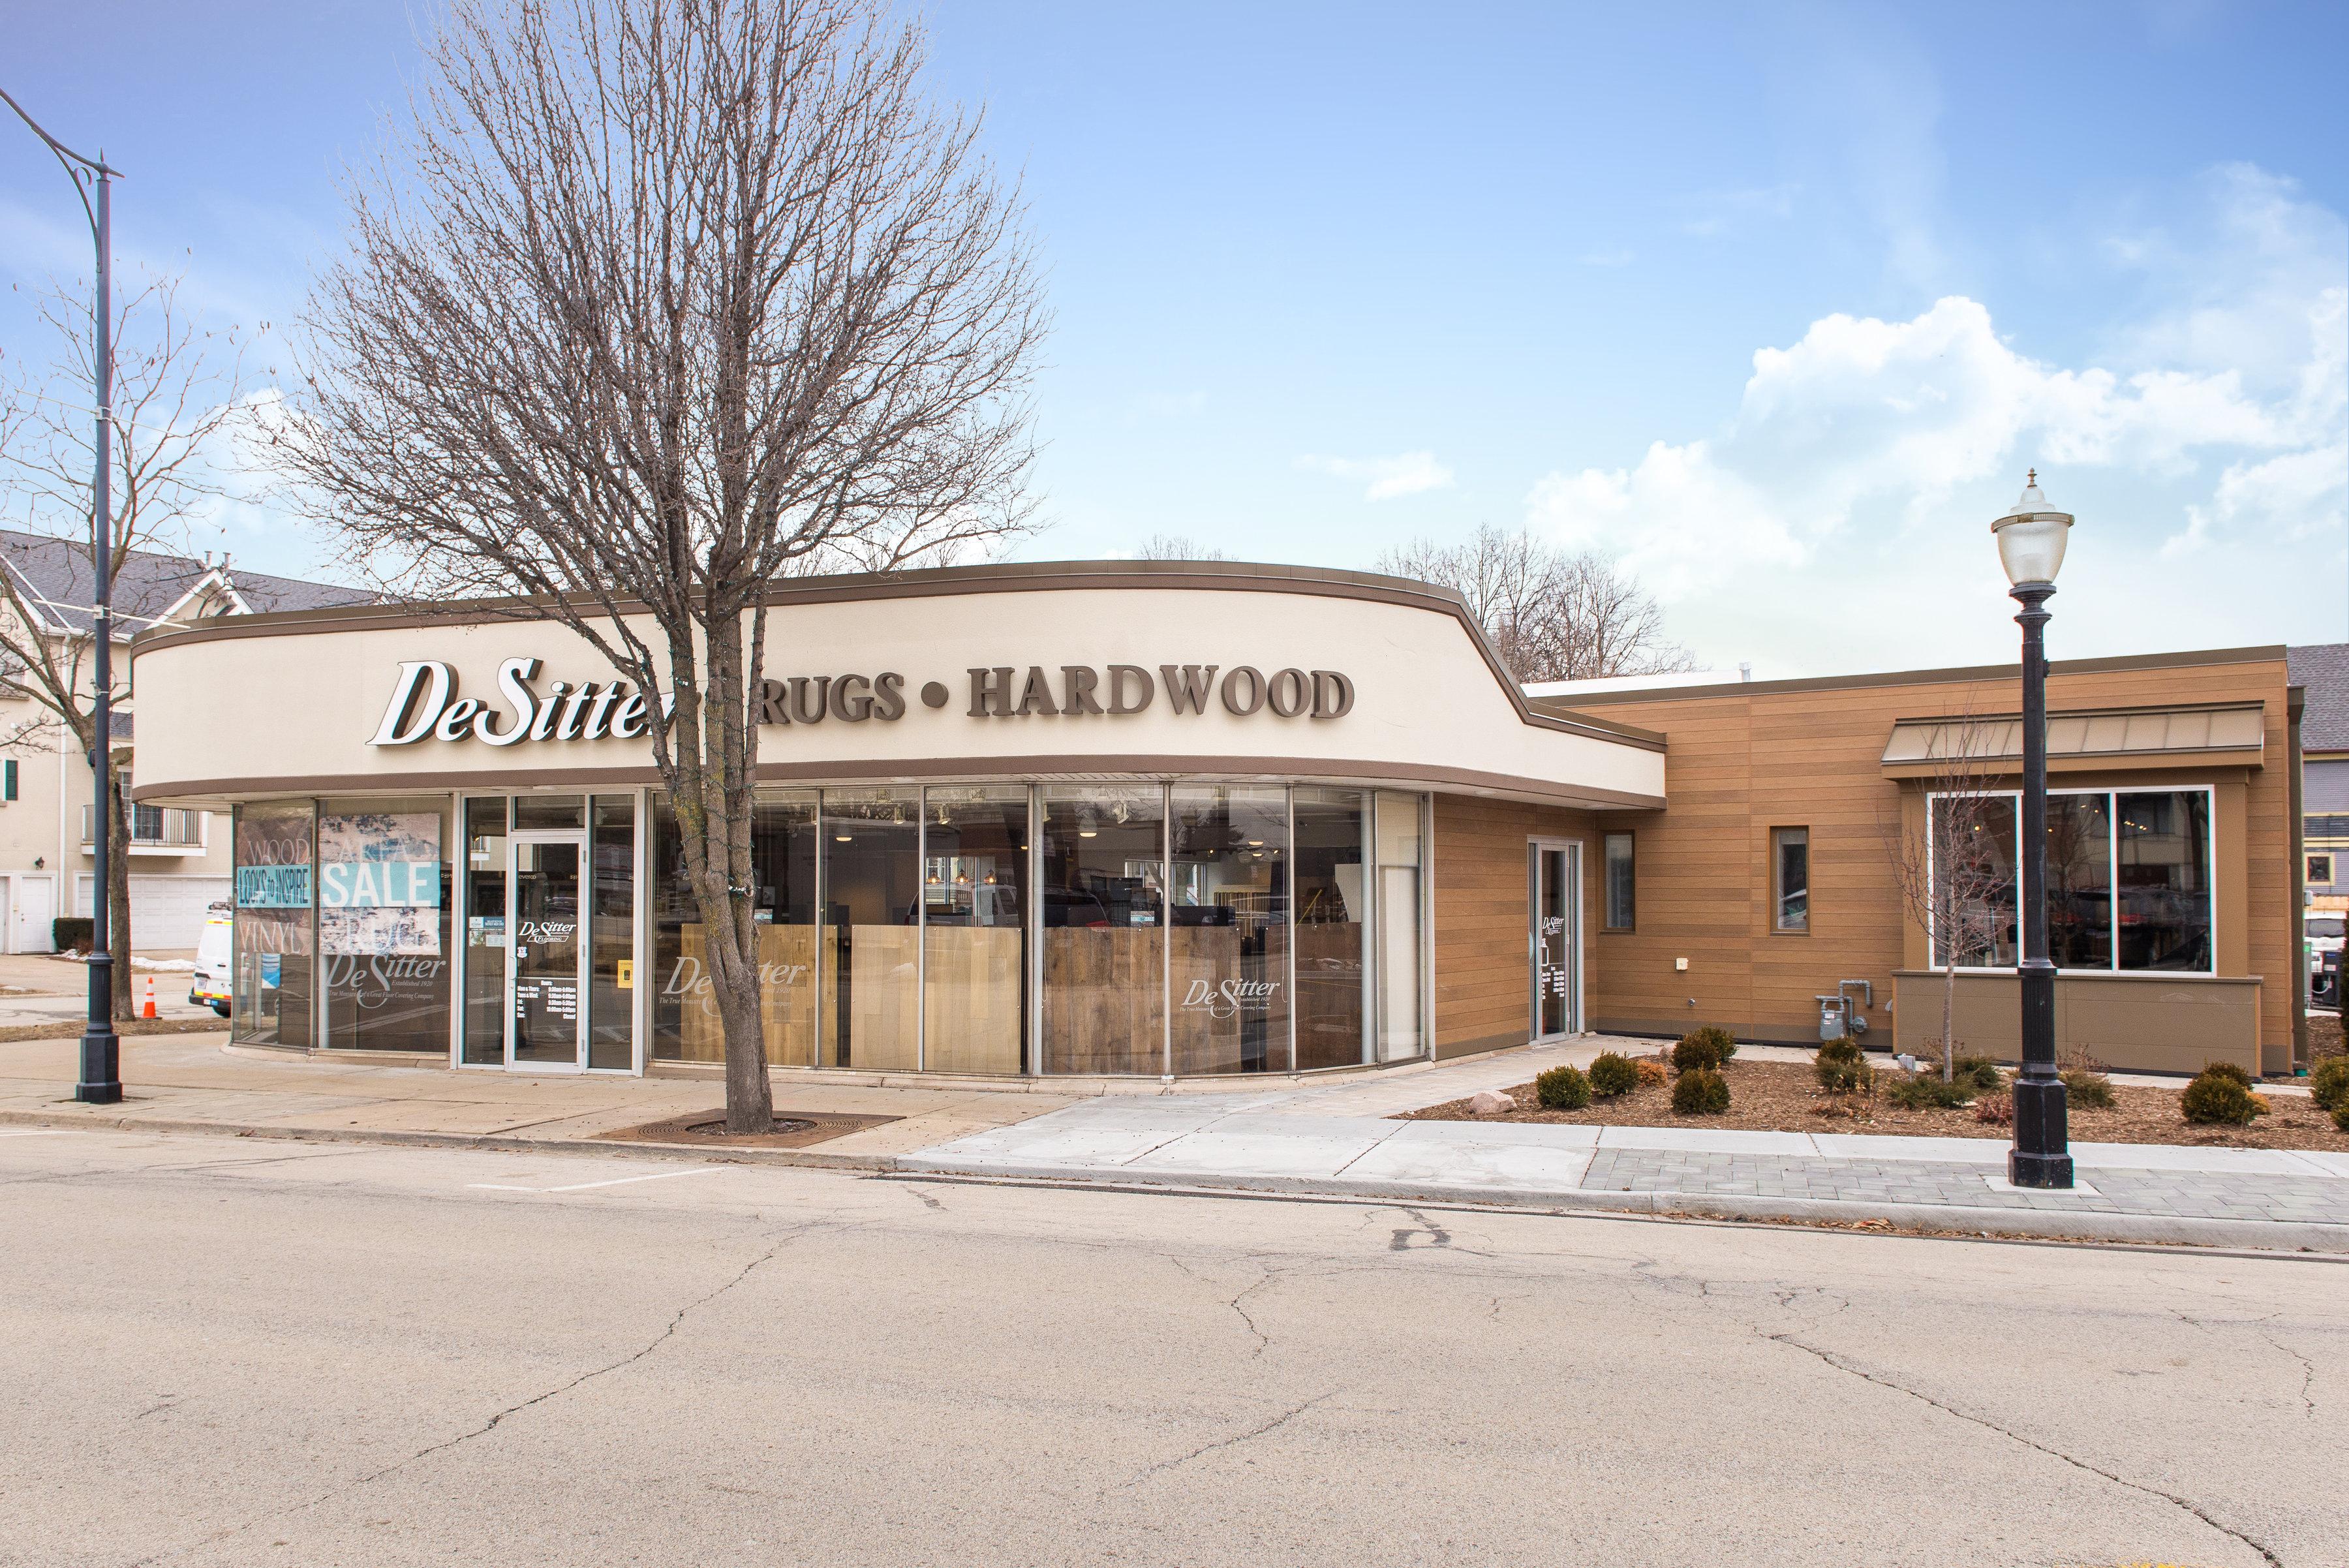 DeSitter Flooring - 1 N Kensington Ave La Grange, IL 60525